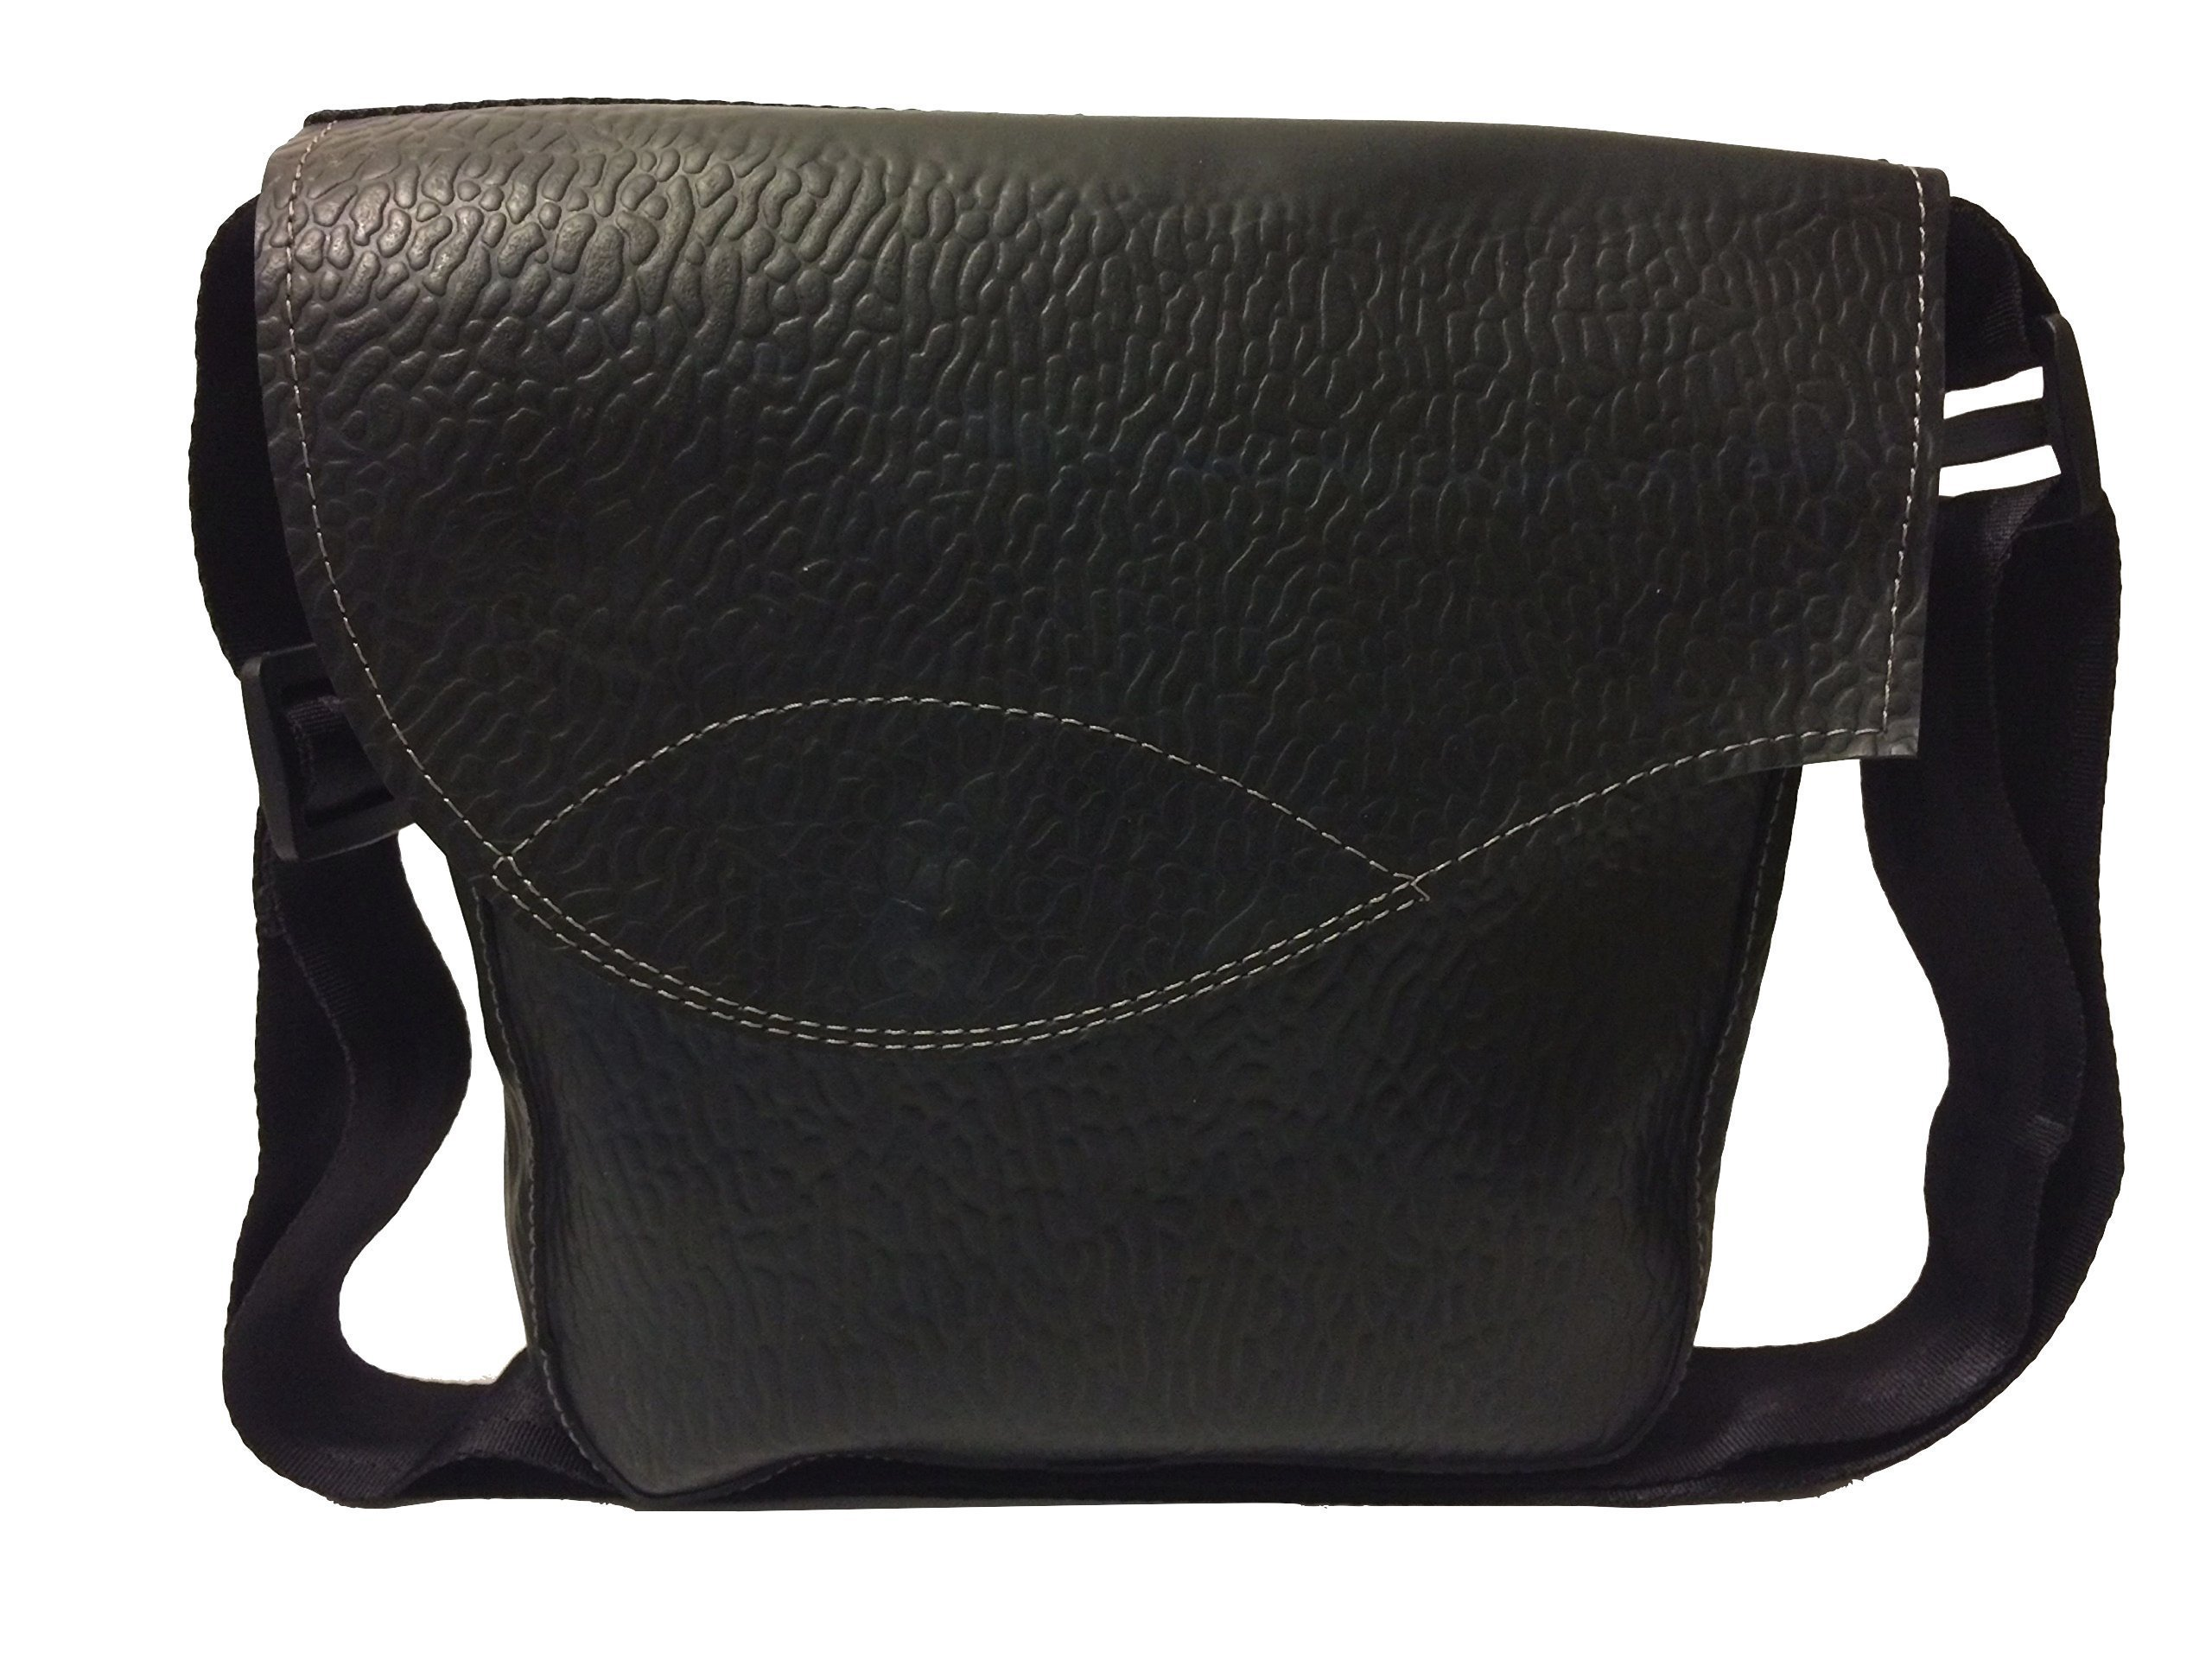 Recycled Rubber shoulder bag Tata - handmade-bags